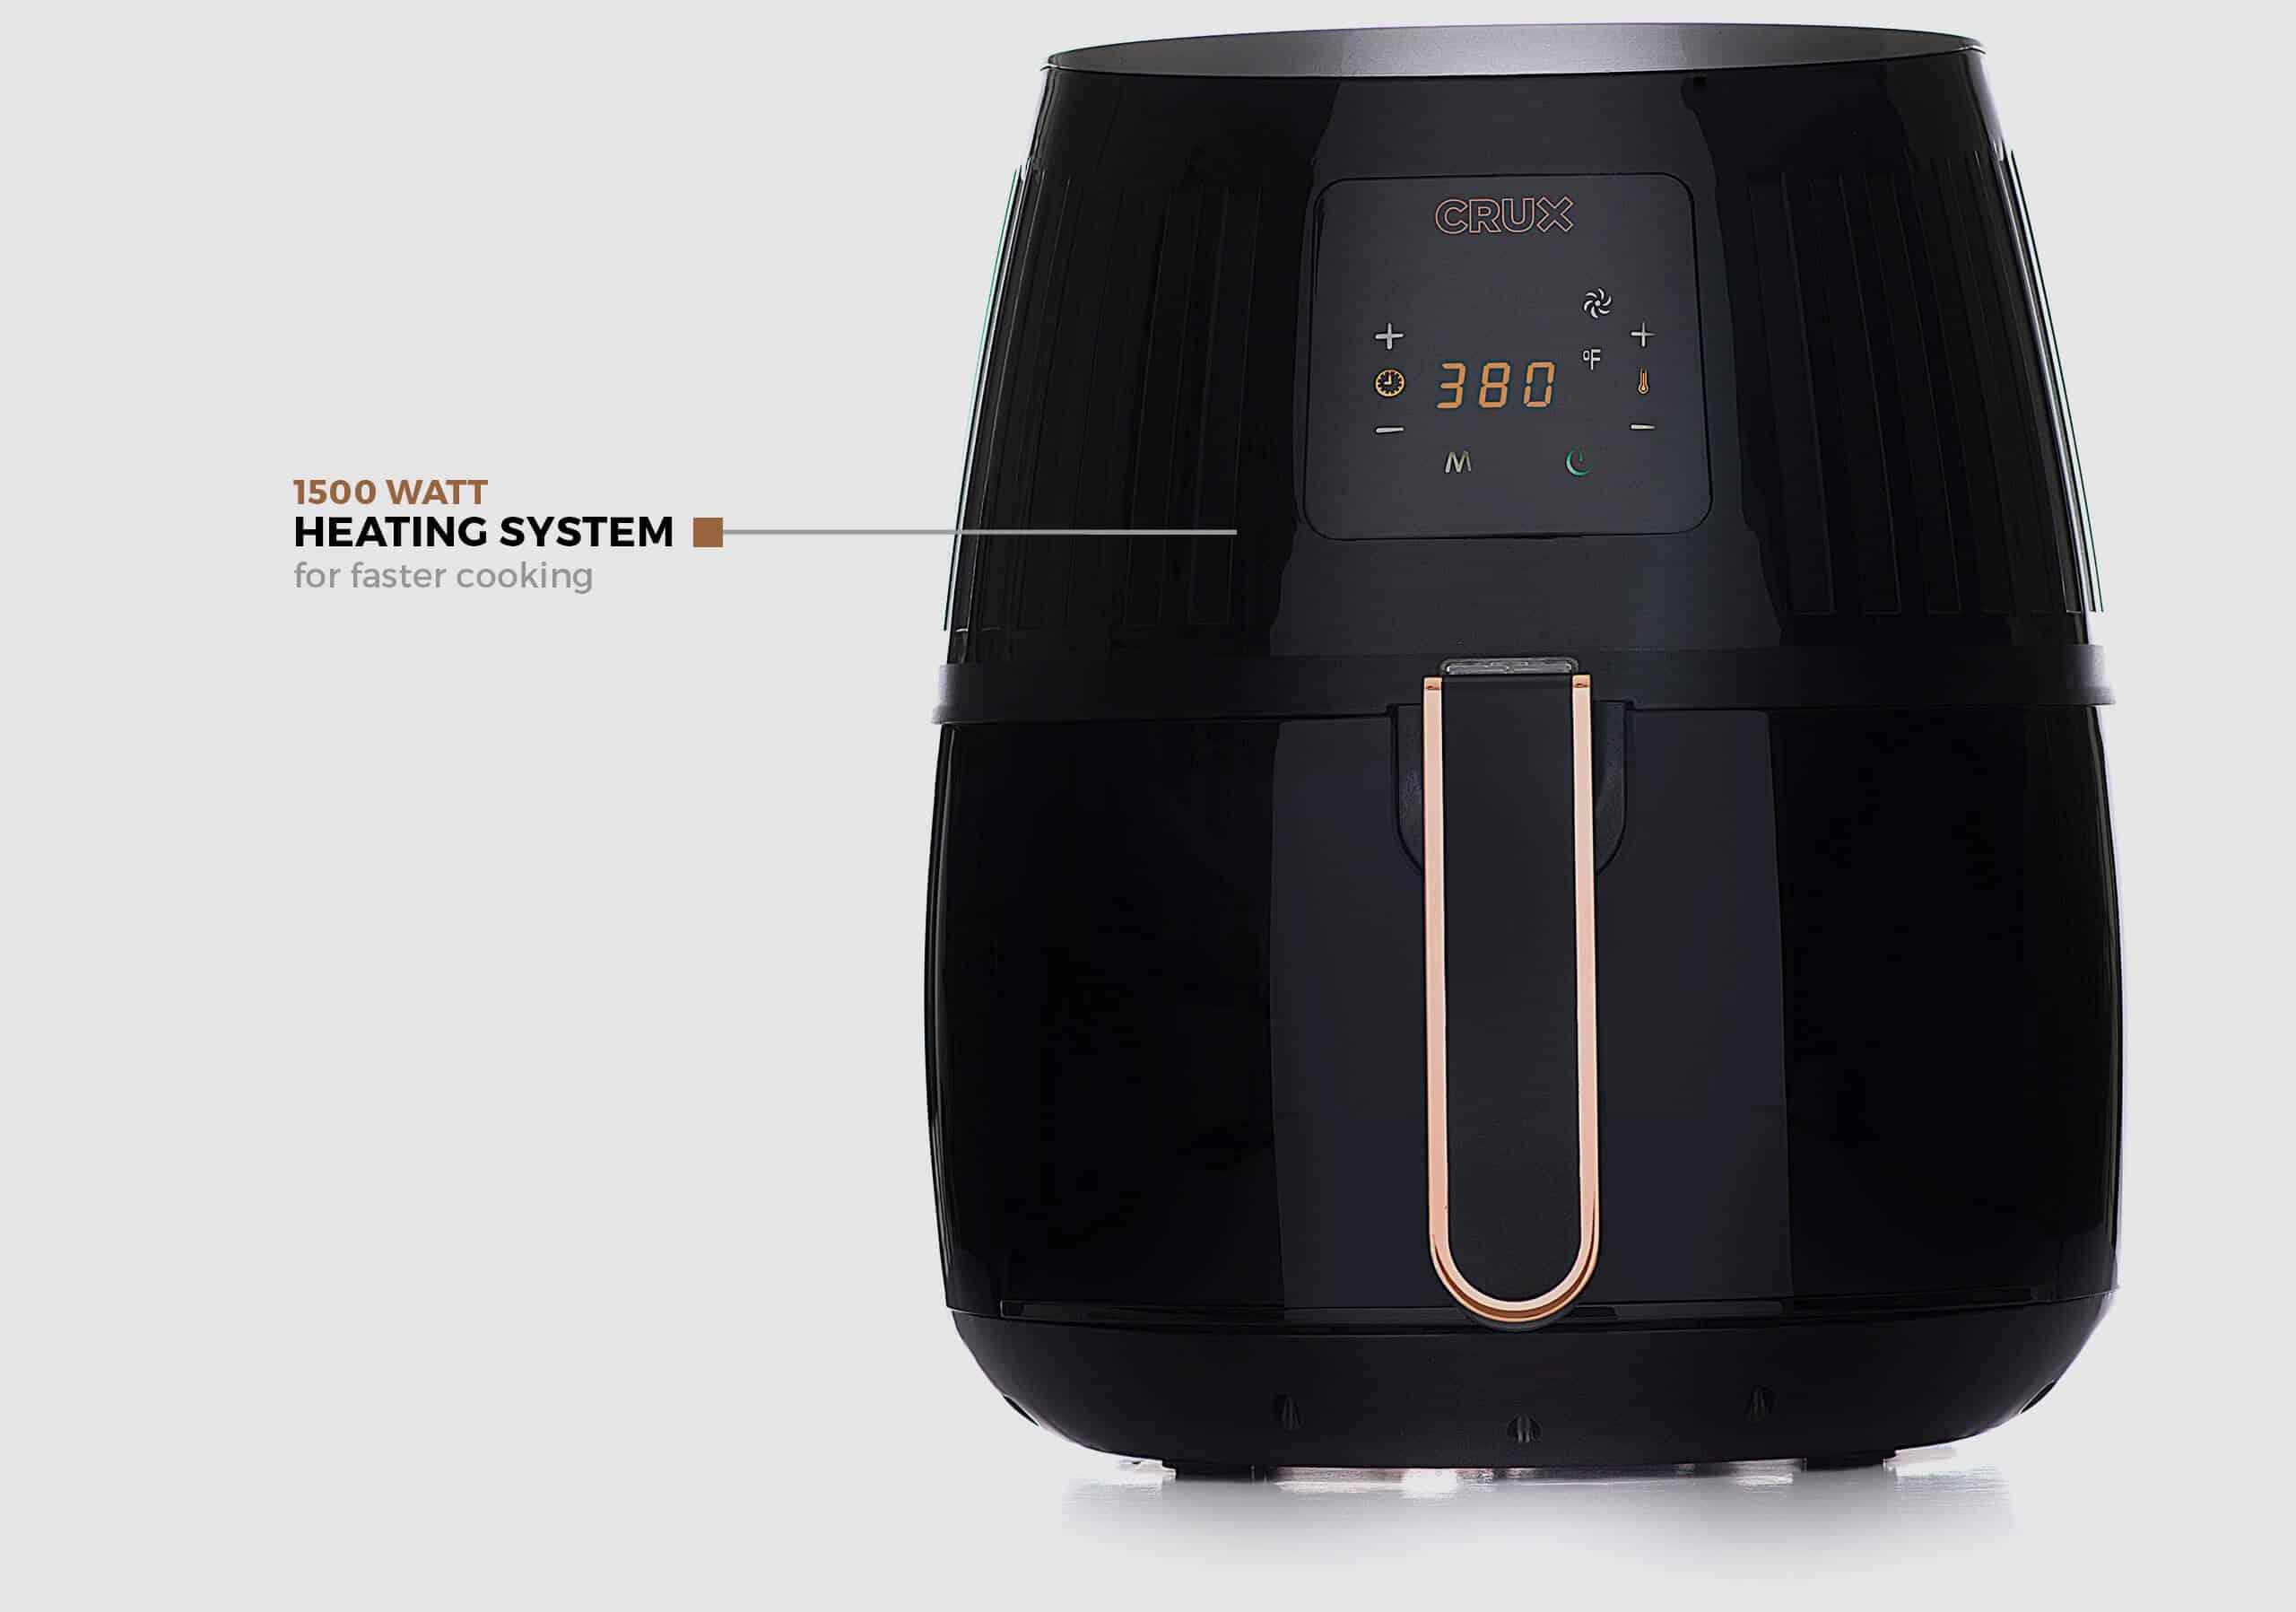 Crux 2.2 Qt. Touchscreen Air Convection Fryer